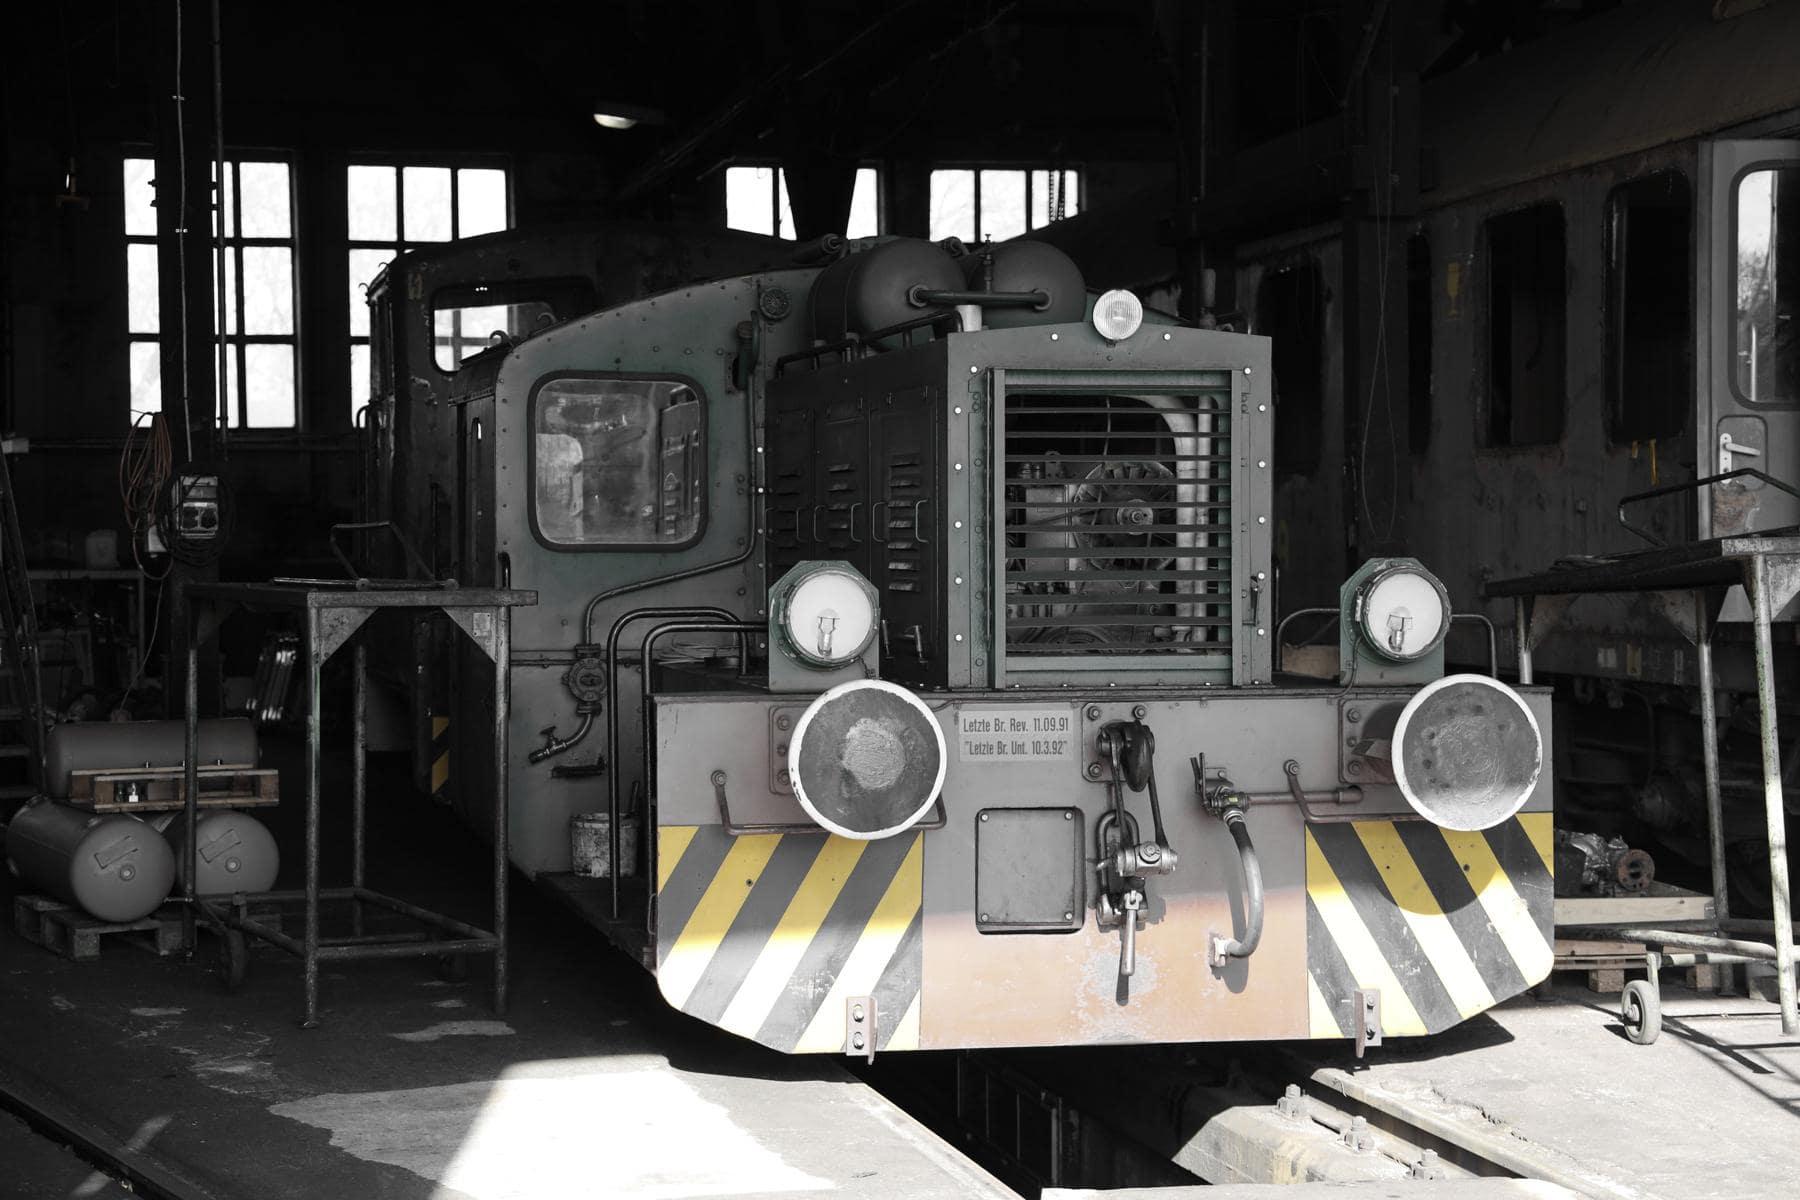 ©Foto: Christian Wodzinski | railmen | 2021 | Eisenbahnmuseum Glauchau